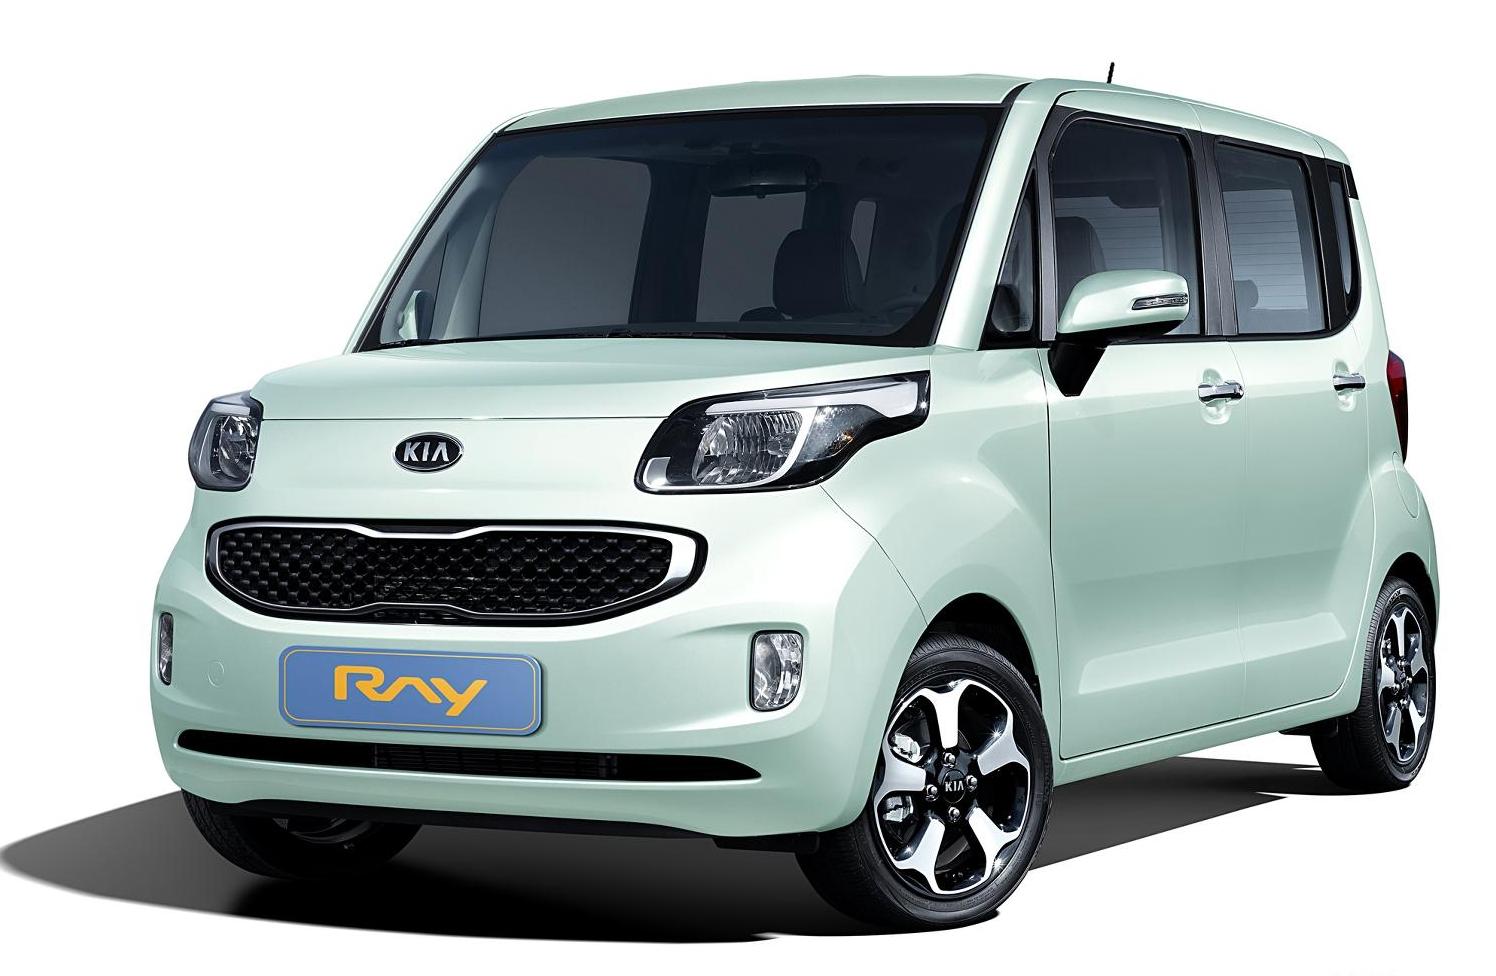 Kia Electric Car >> Forbidden Fruit Kia Ray Electric Car Not Due In U S